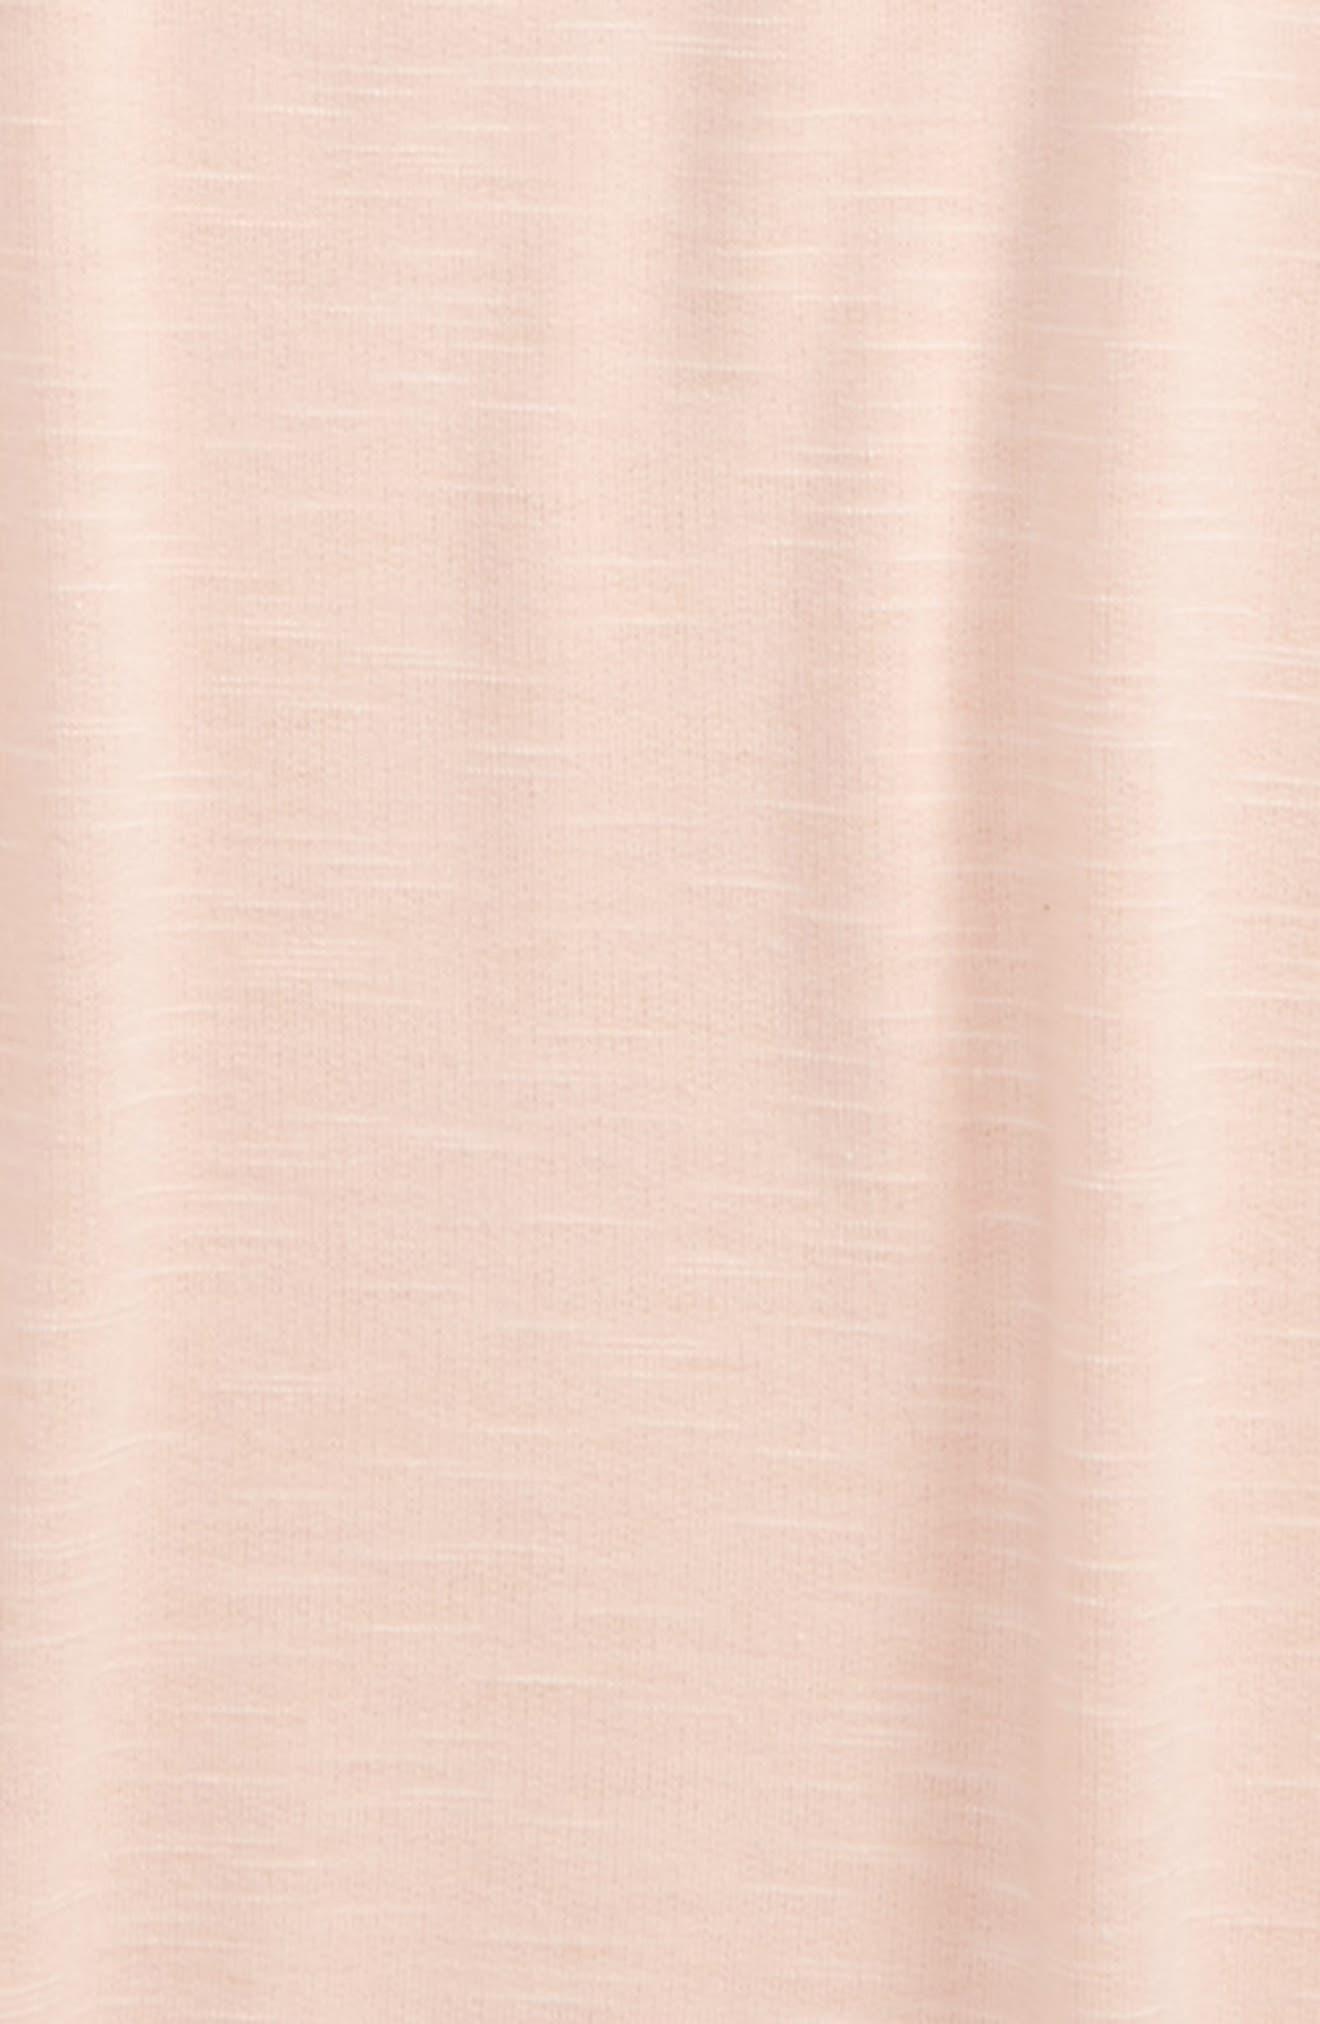 Imitation Pearl Embellished Sweatshirt,                             Alternate thumbnail 2, color,                             Blush